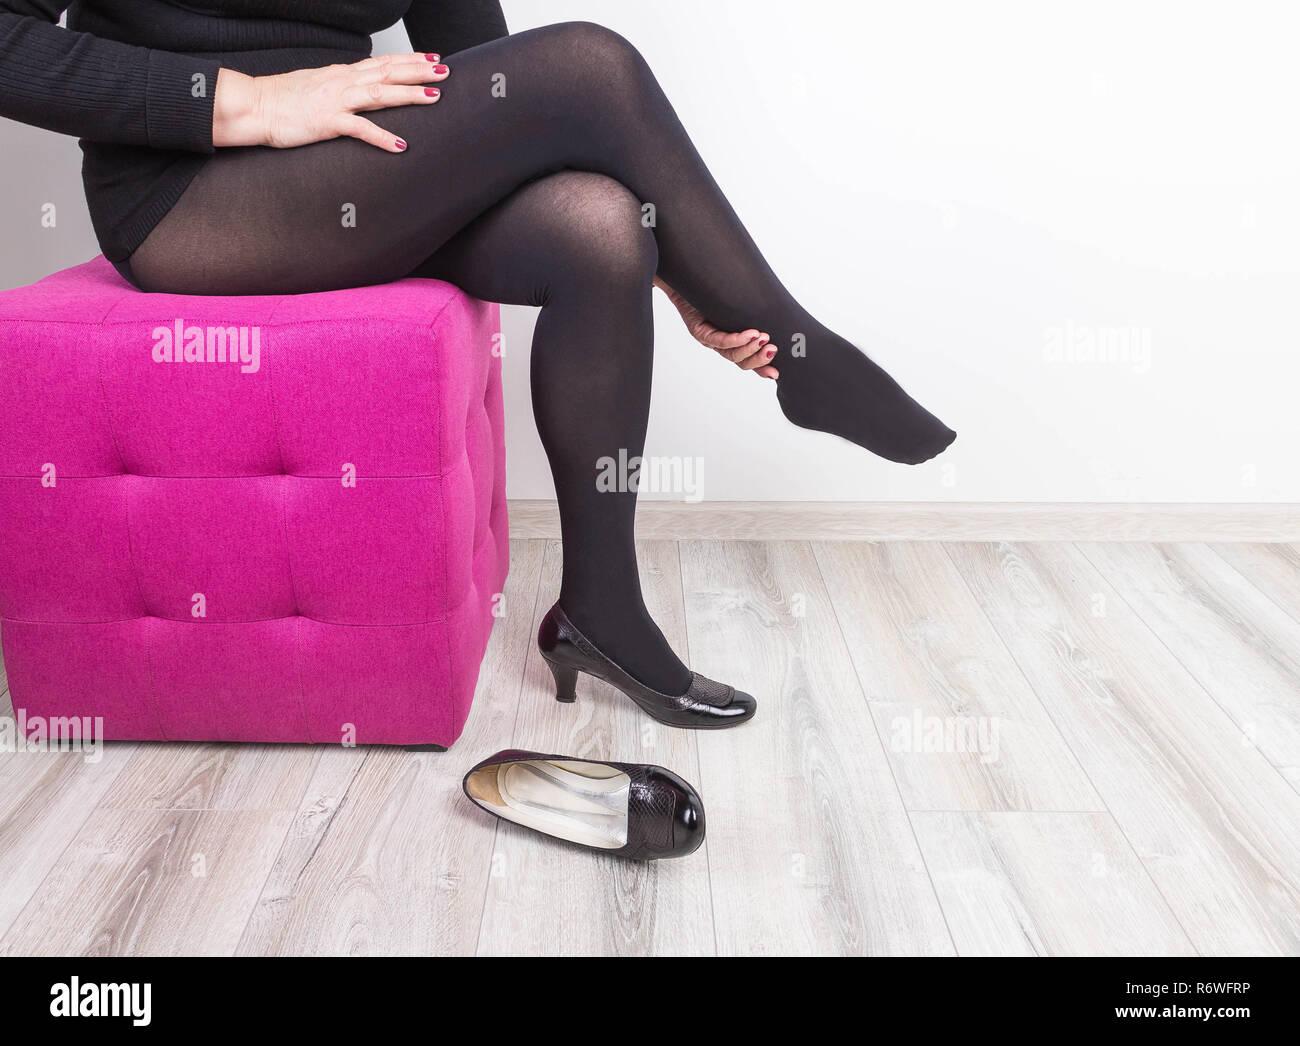 High Of Thigh Stockfotos & High Of Thigh Bilder Alamy